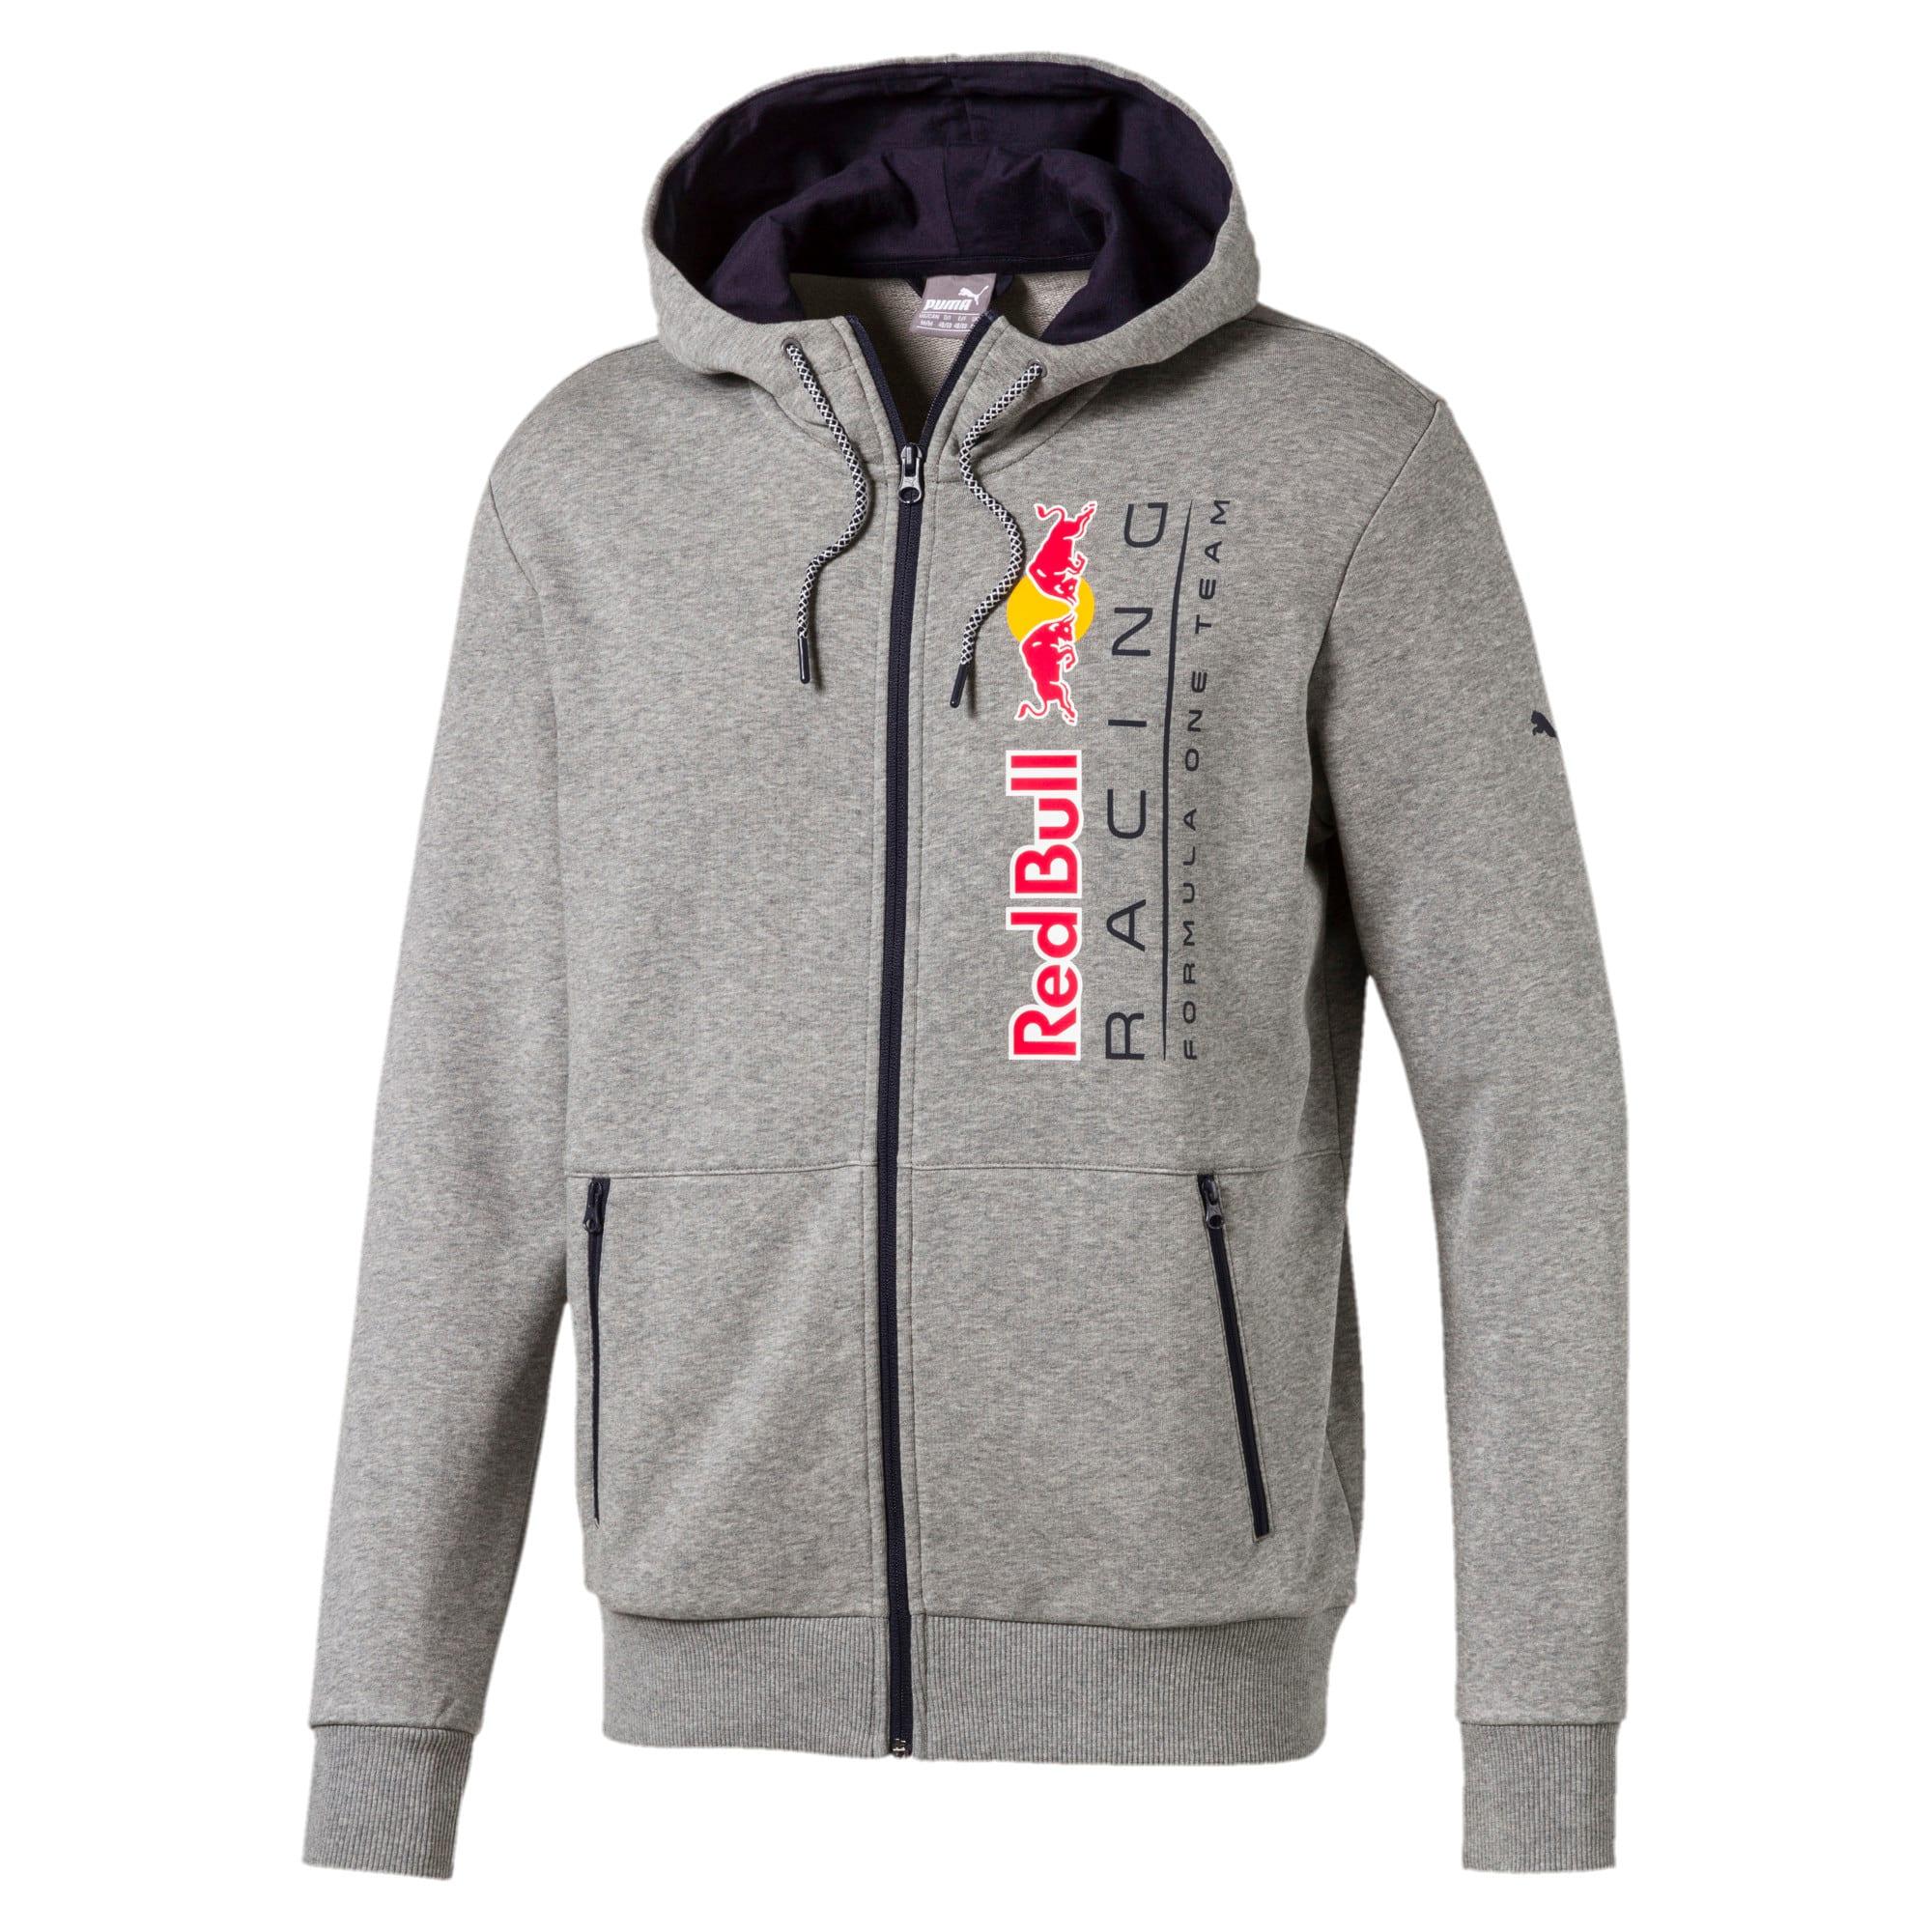 Thumbnail 2 of Red Bull Racing Lifestyle Men's Hooded Sweat Jacket, Medium Gray Heather - 1, medium